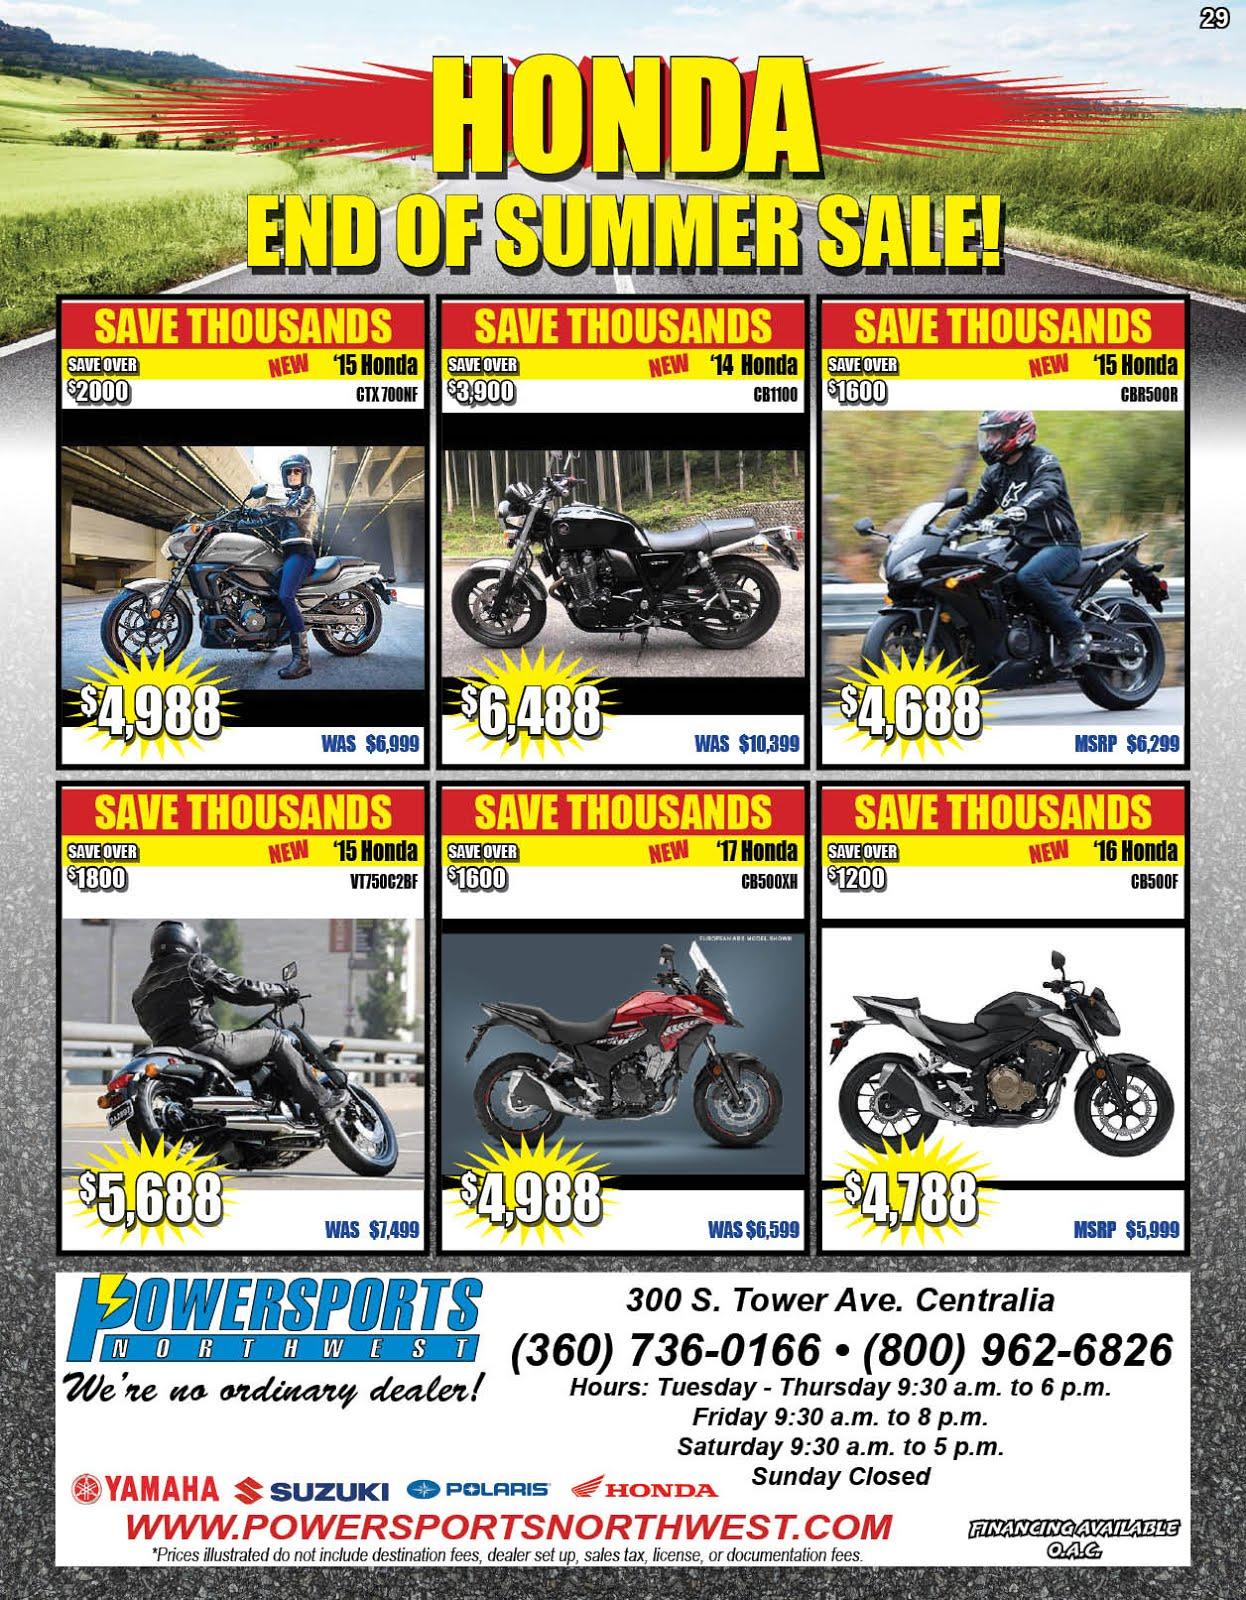 Honda End of Summer Sale @ Powersports Northwest!!